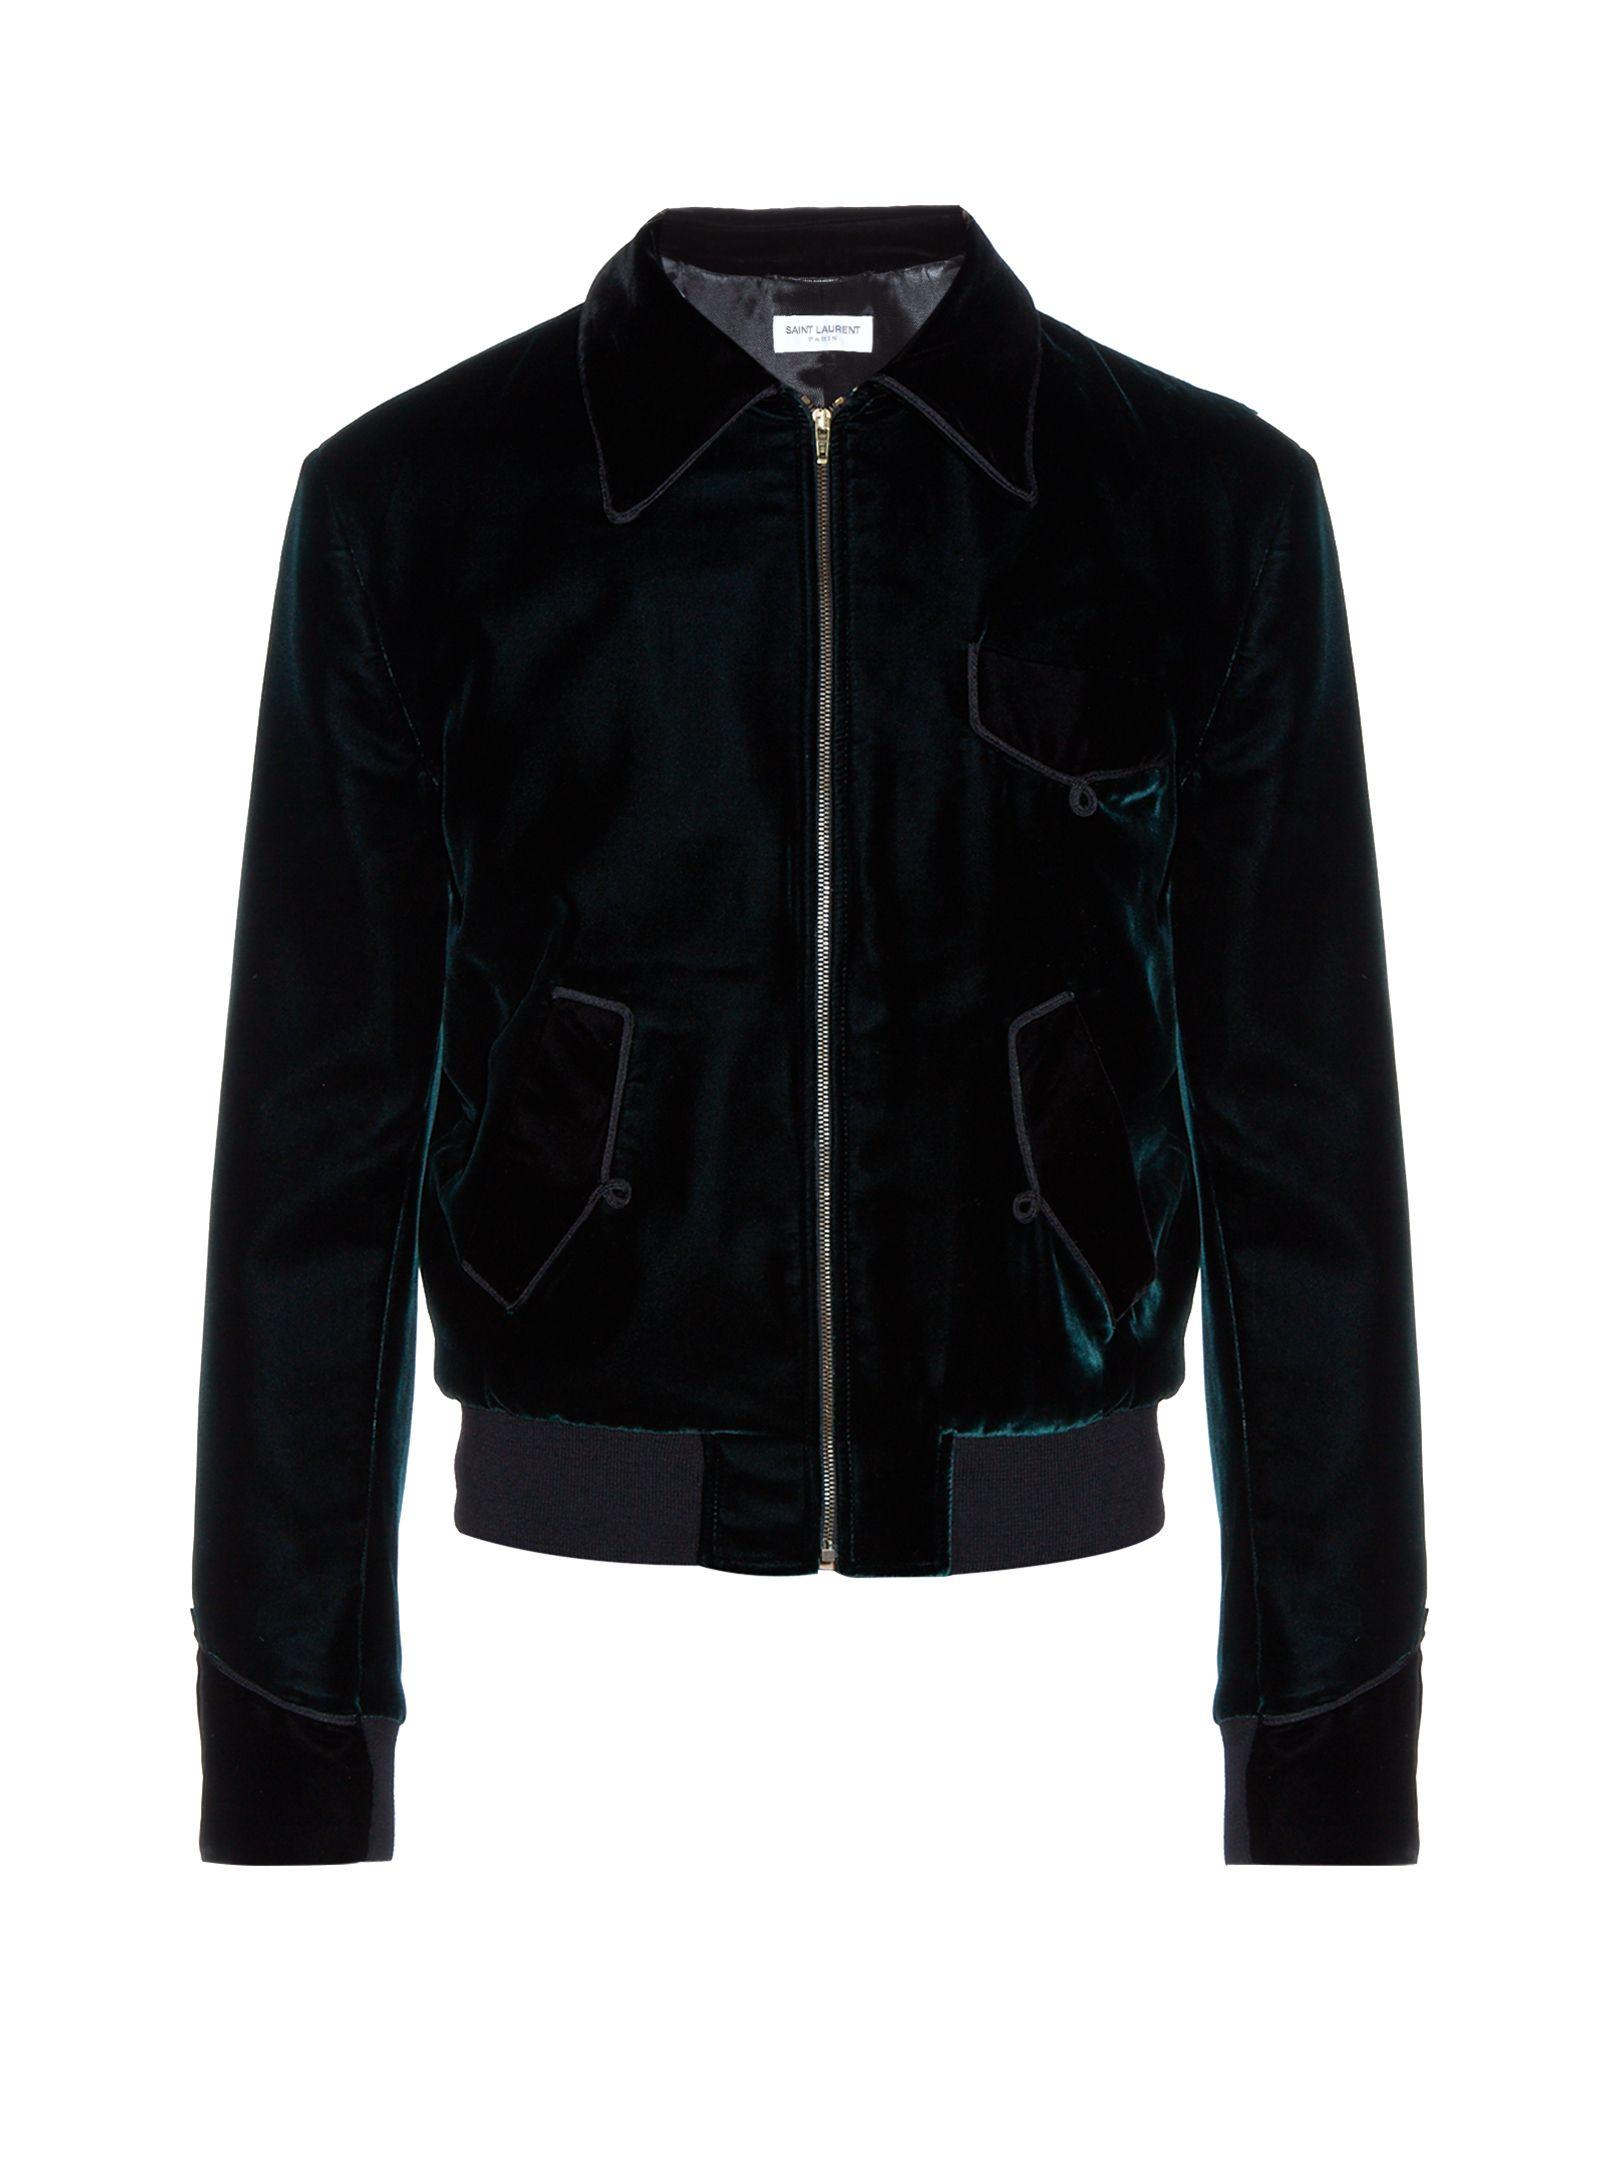 Point-collar velvet bomber jacket | Saint Laurent | MATCHESFASHION.COM UK